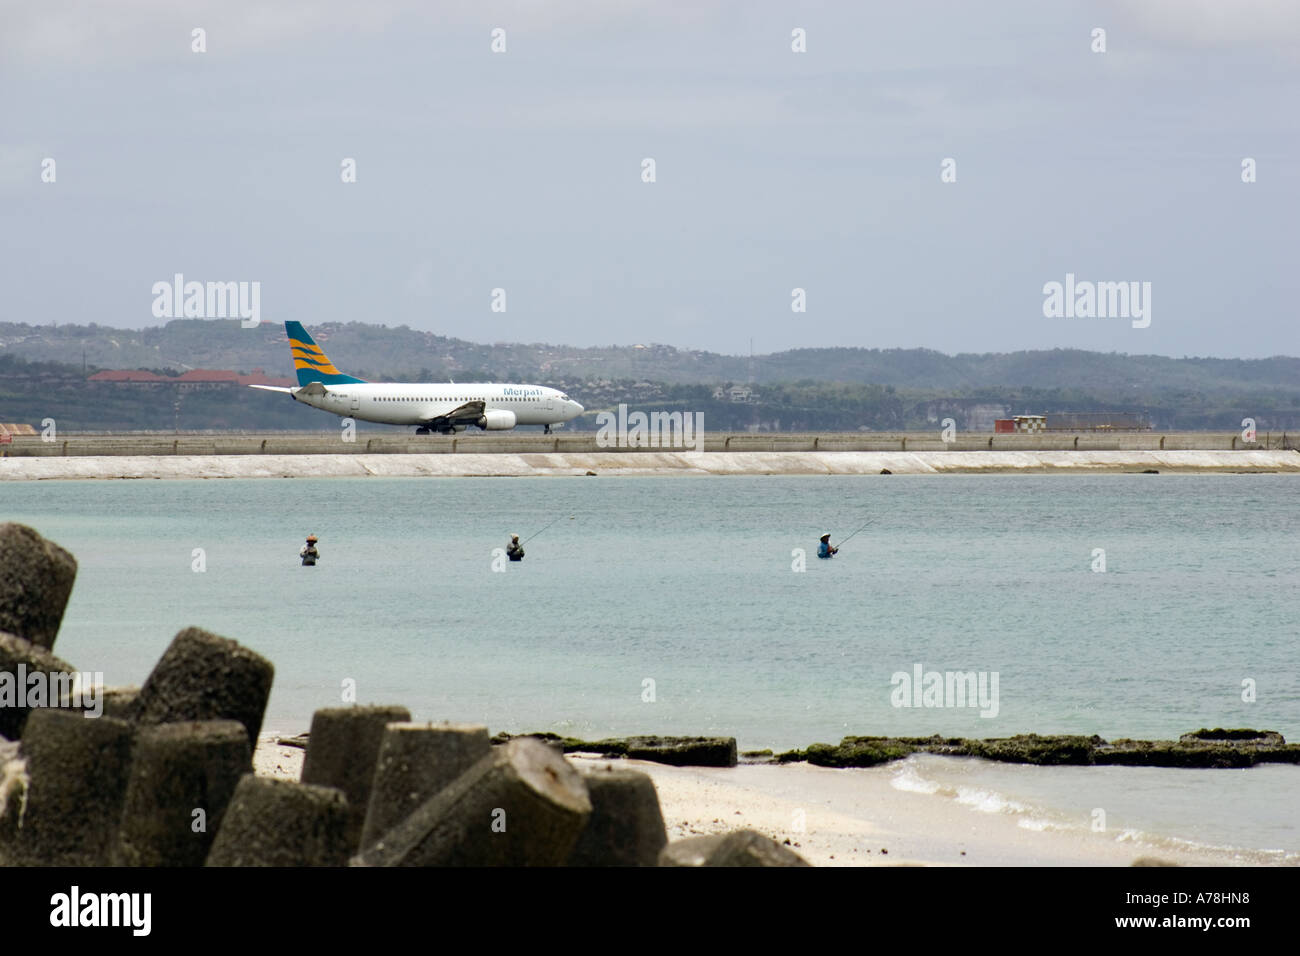 Aeroporto Bali : Denpasar bali airport stock photos denpasar bali airport stock